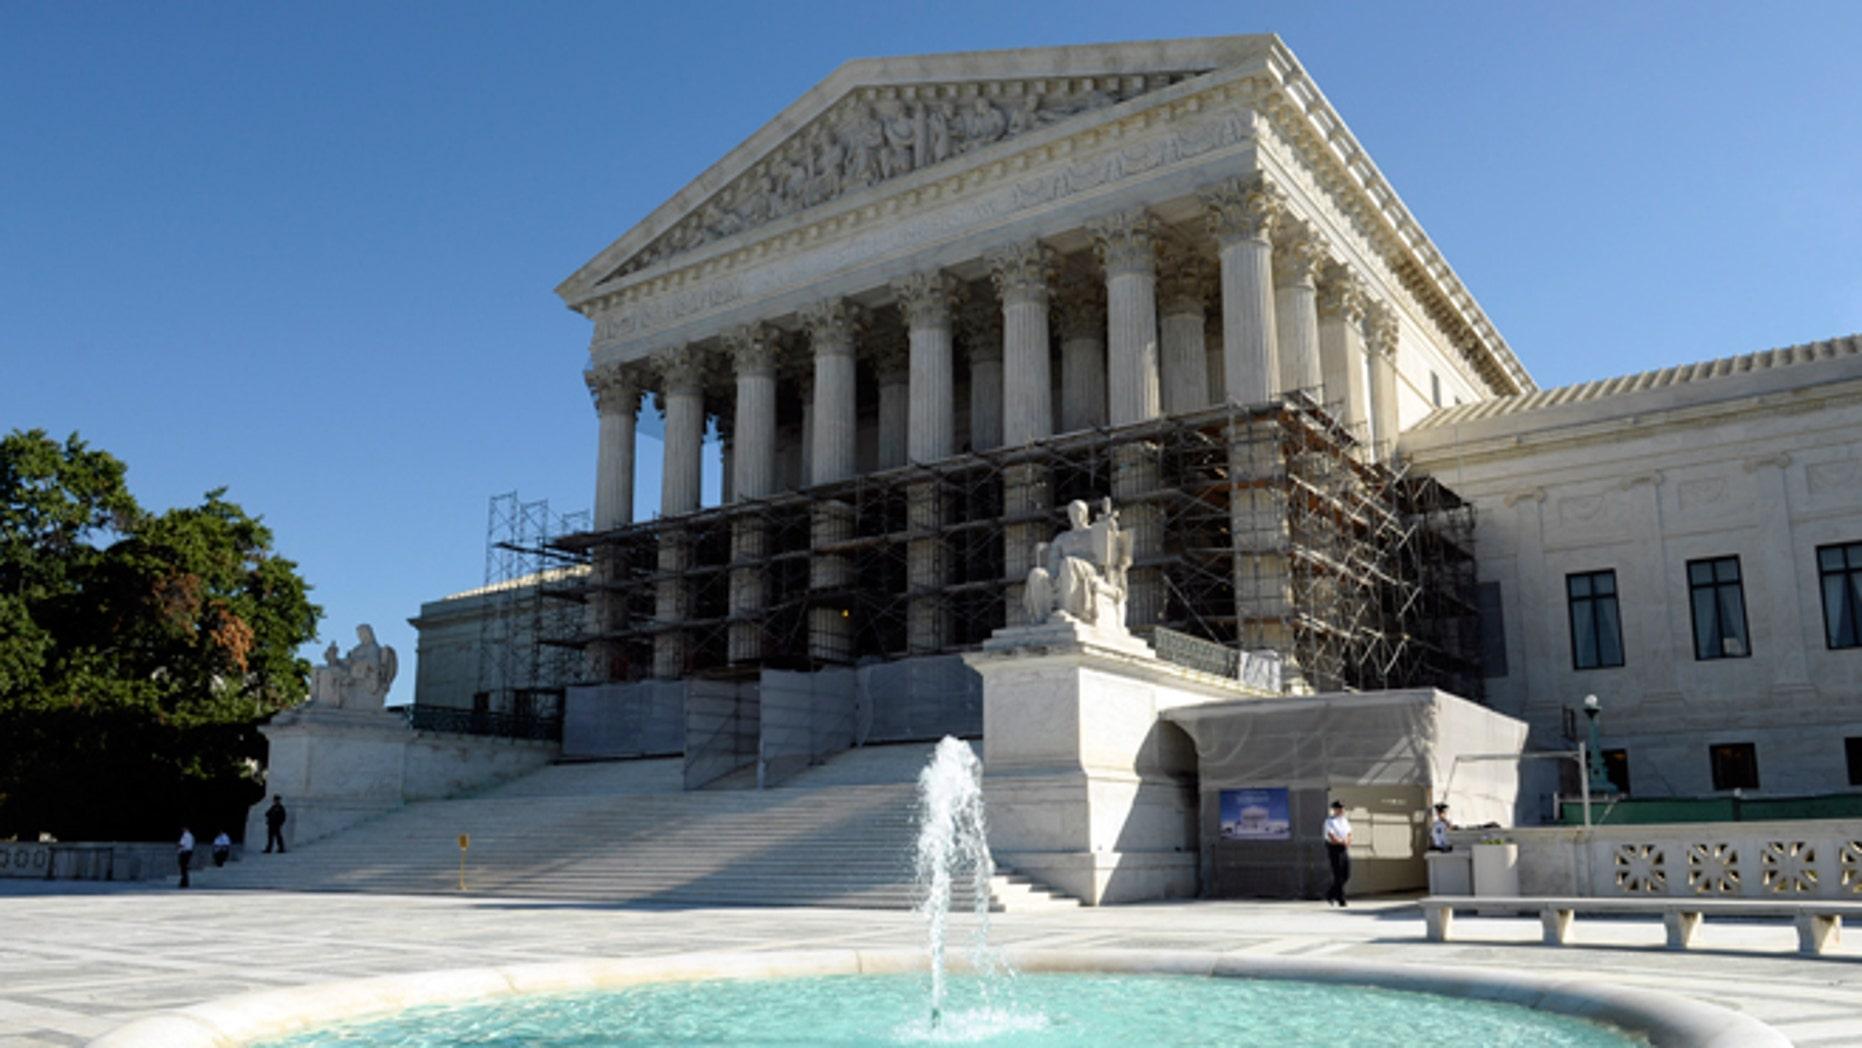 FILE -- Oct. 15, 2013: The Supreme Court in Washington.